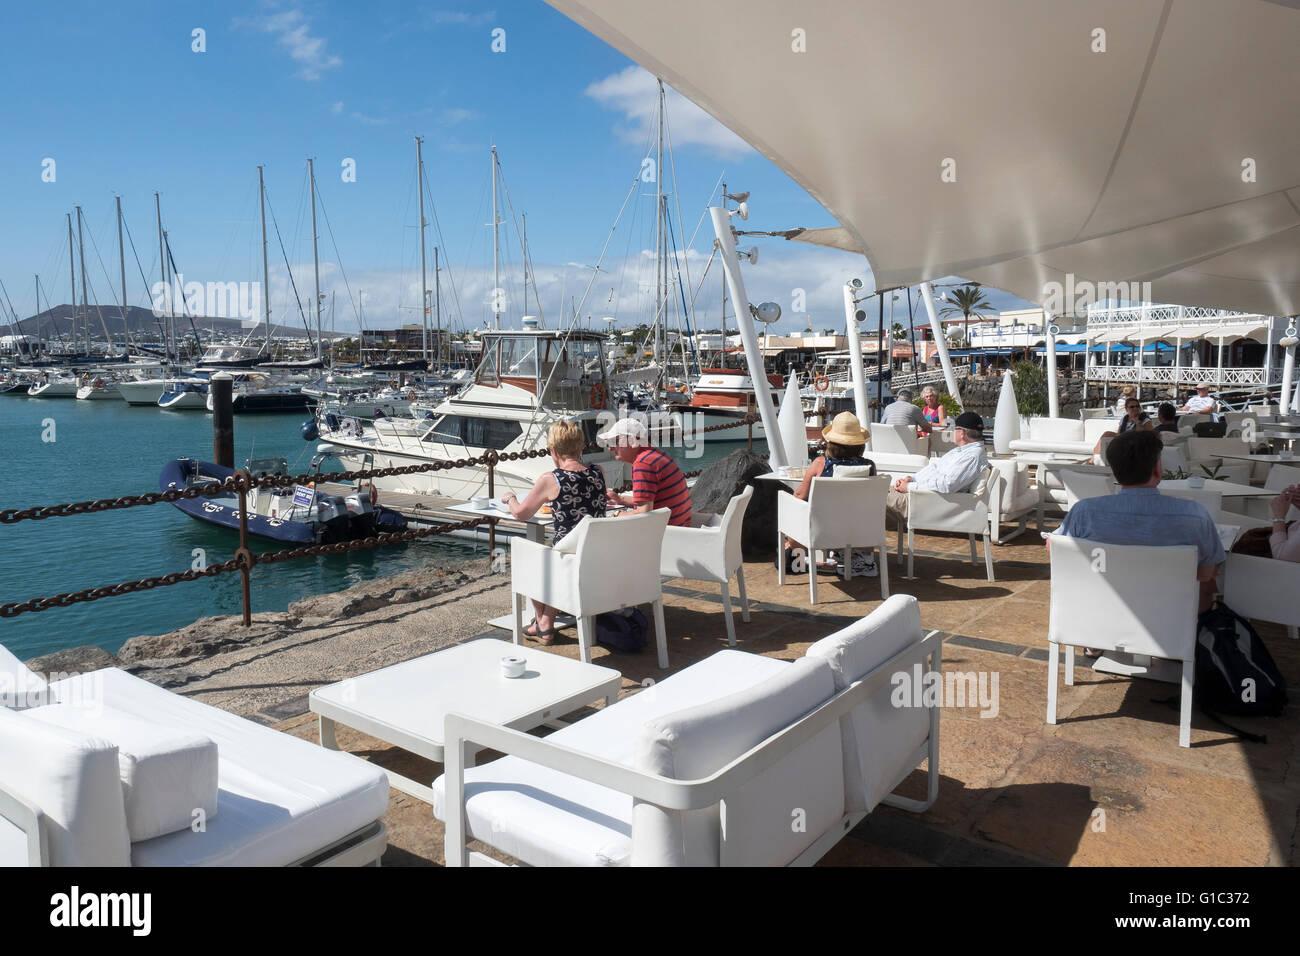 Harbourside Cafe, Playa Blanca, Lanzarote, Canary Islands, Spain - Stock Image